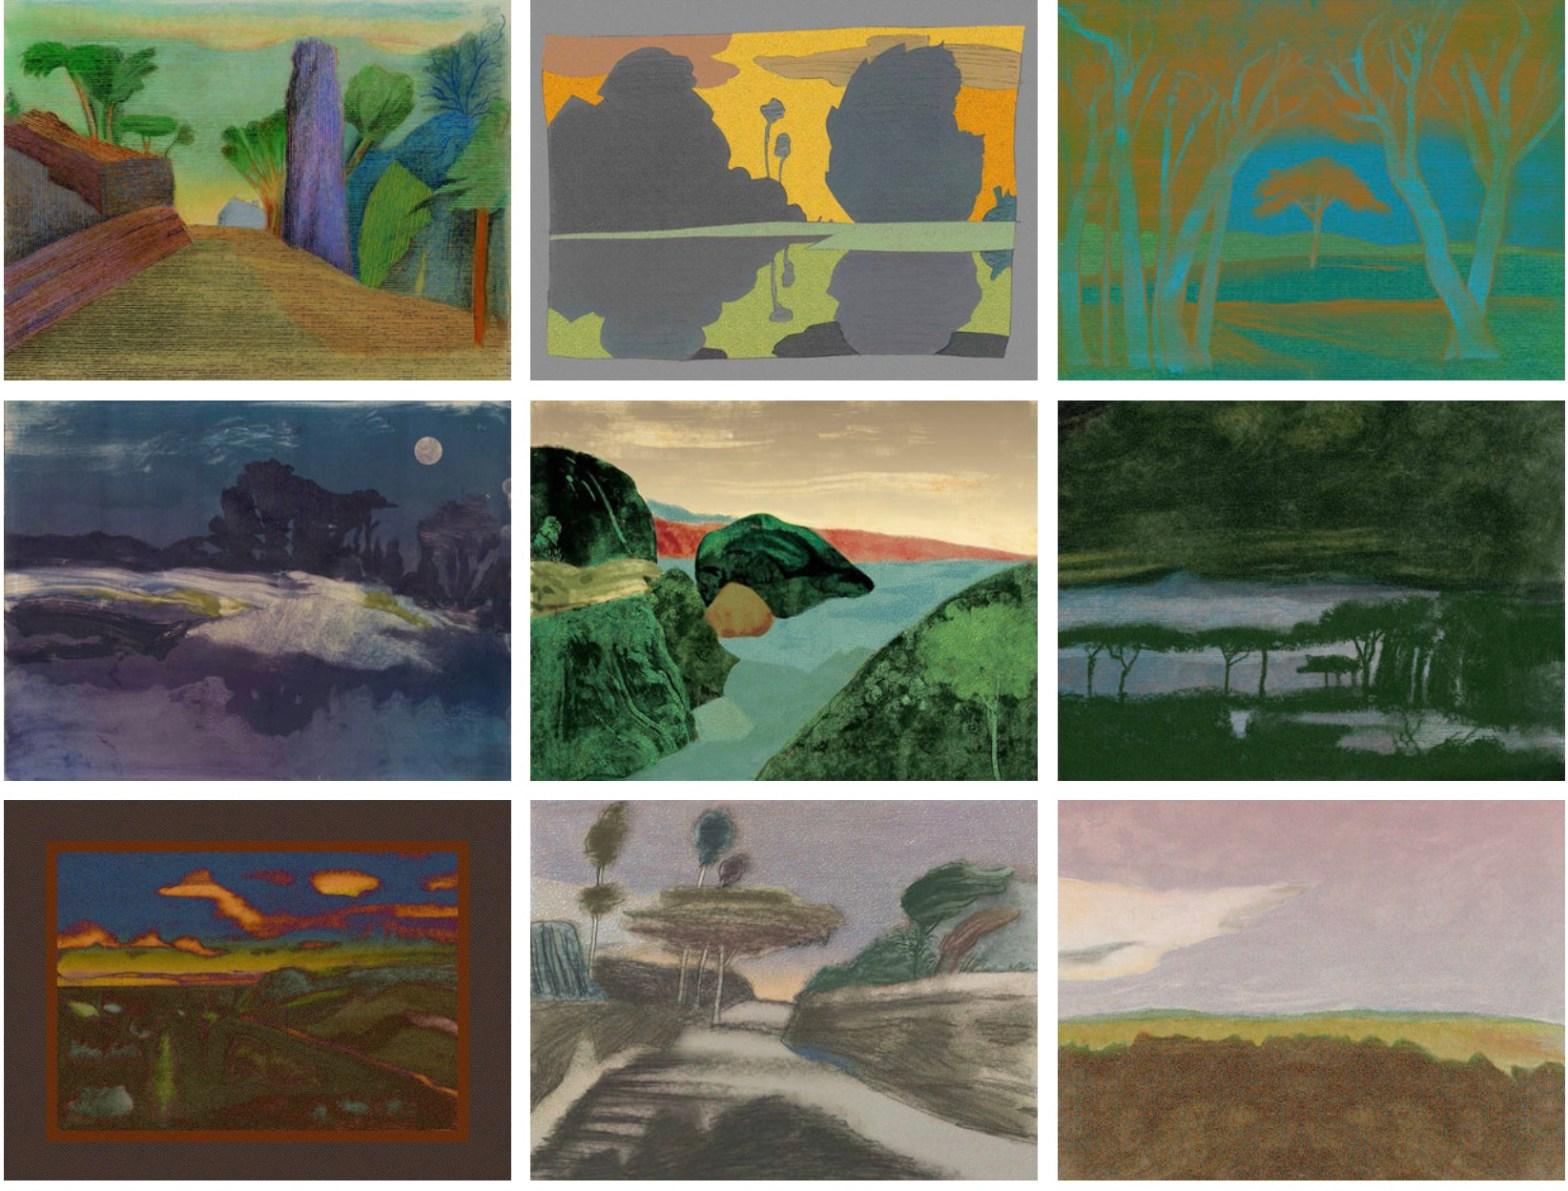 Thumbnail for Landscapes by Glaser